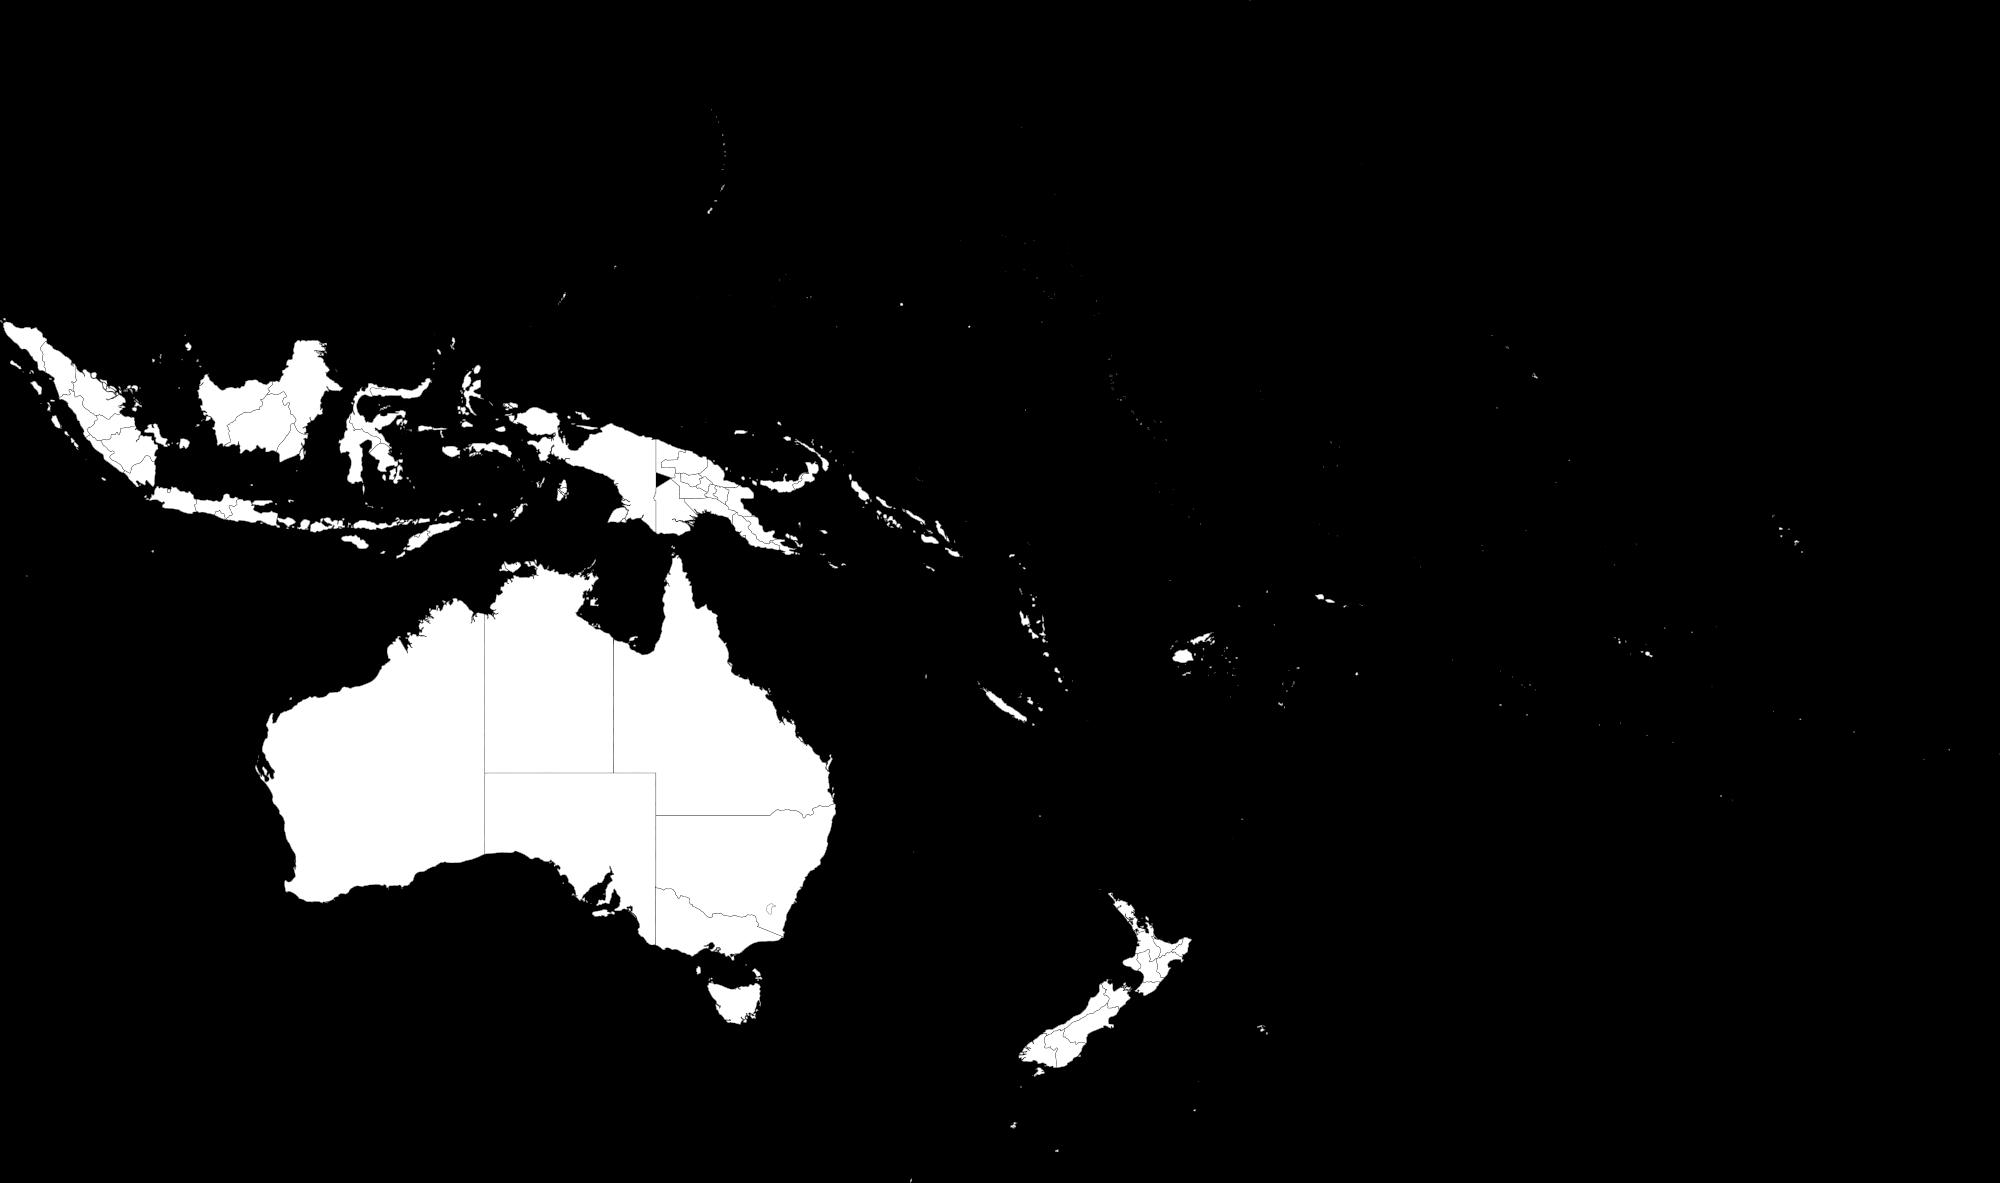 Mapa de Oceanía de 1998